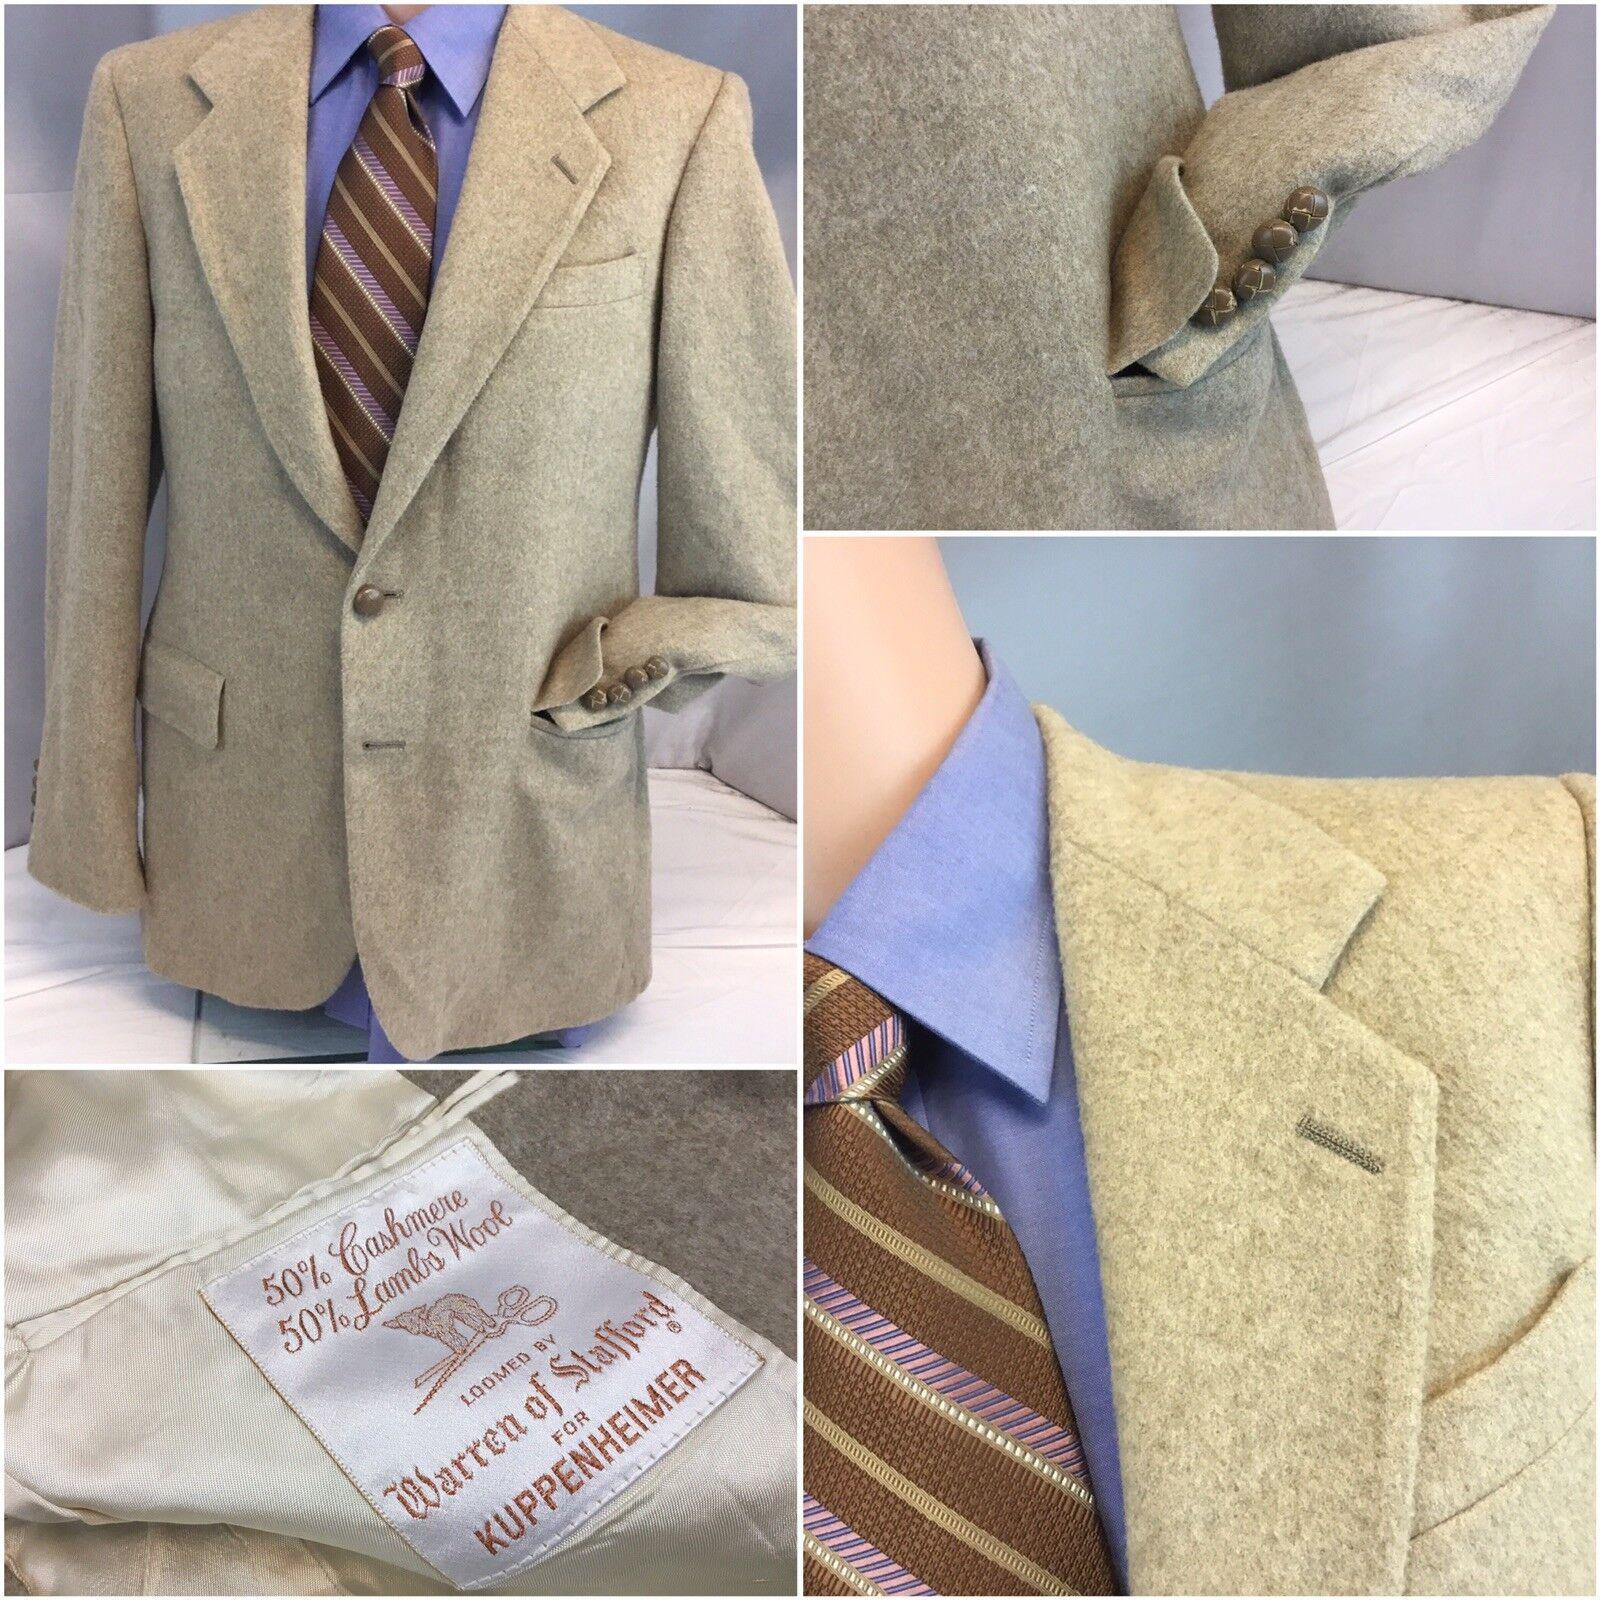 Warren Of Stafford Blazer 38R Beige Cashmere Wool USA Mint YGI L8-526